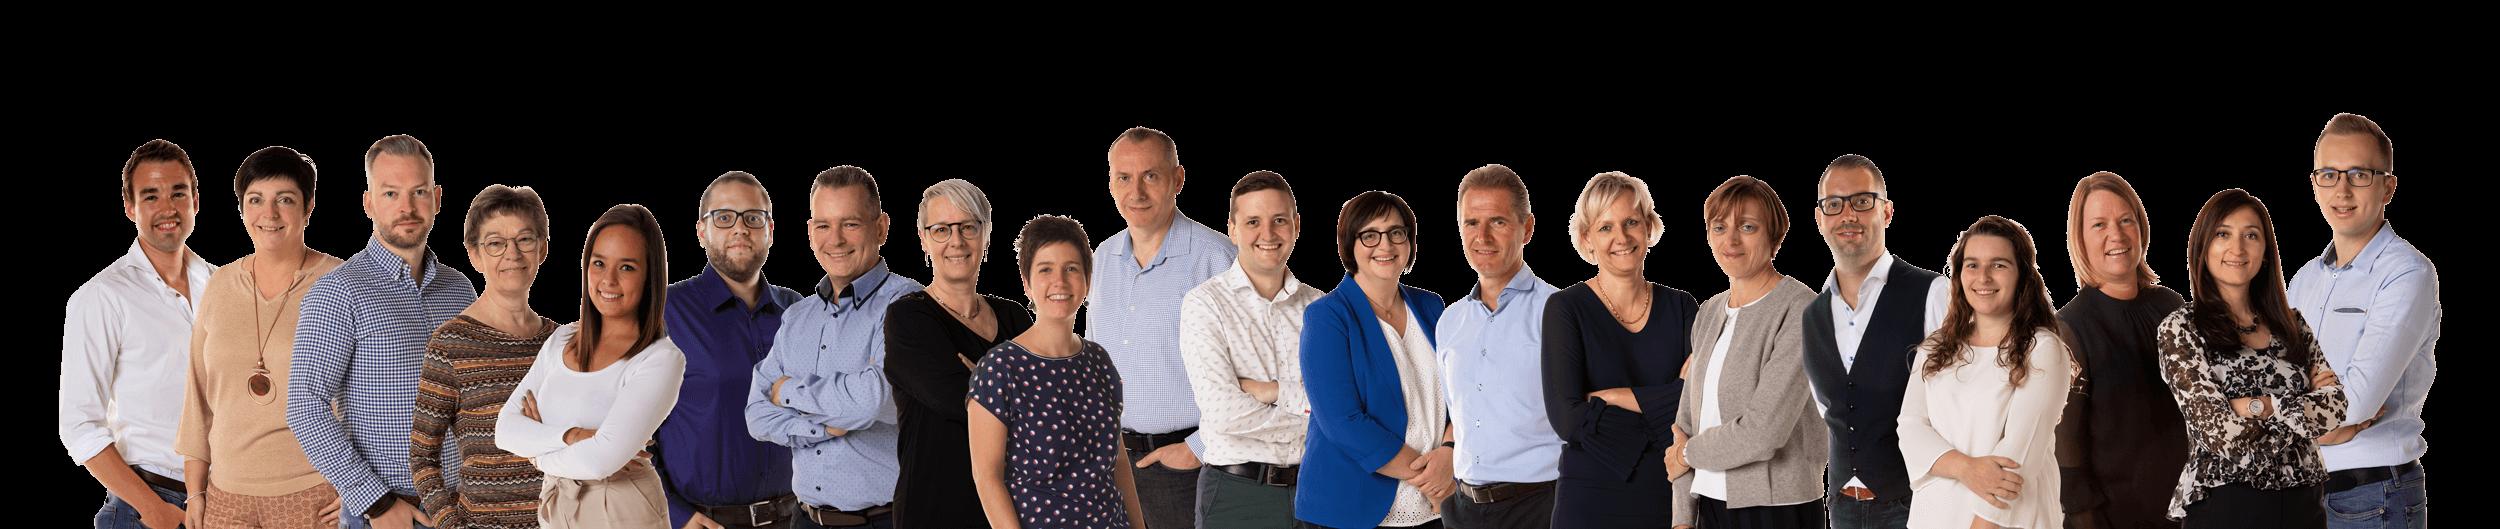 Voets - Wysmans Team - familie